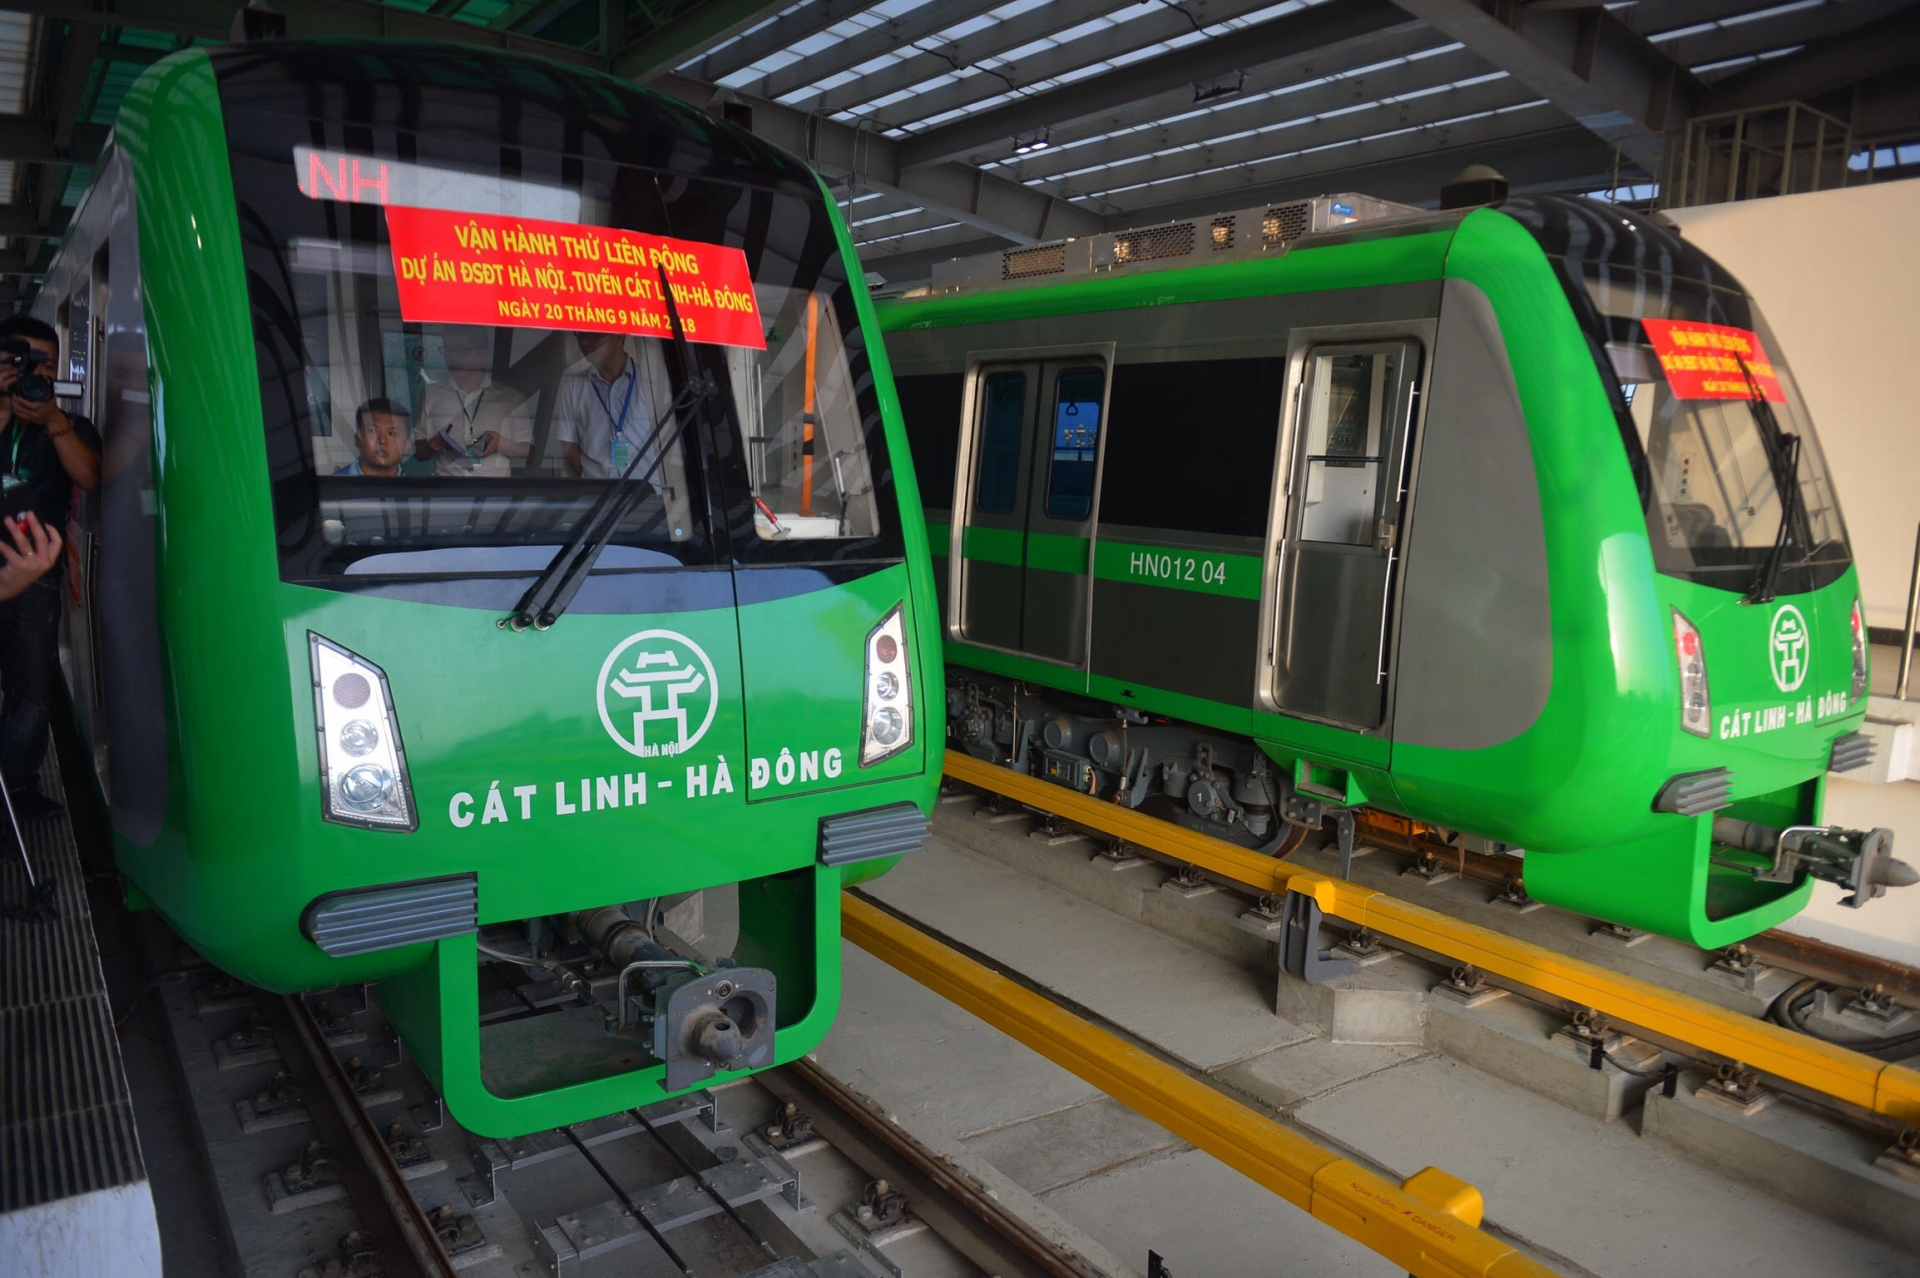 Cat Linh-Hadong elevated urban railway first test run